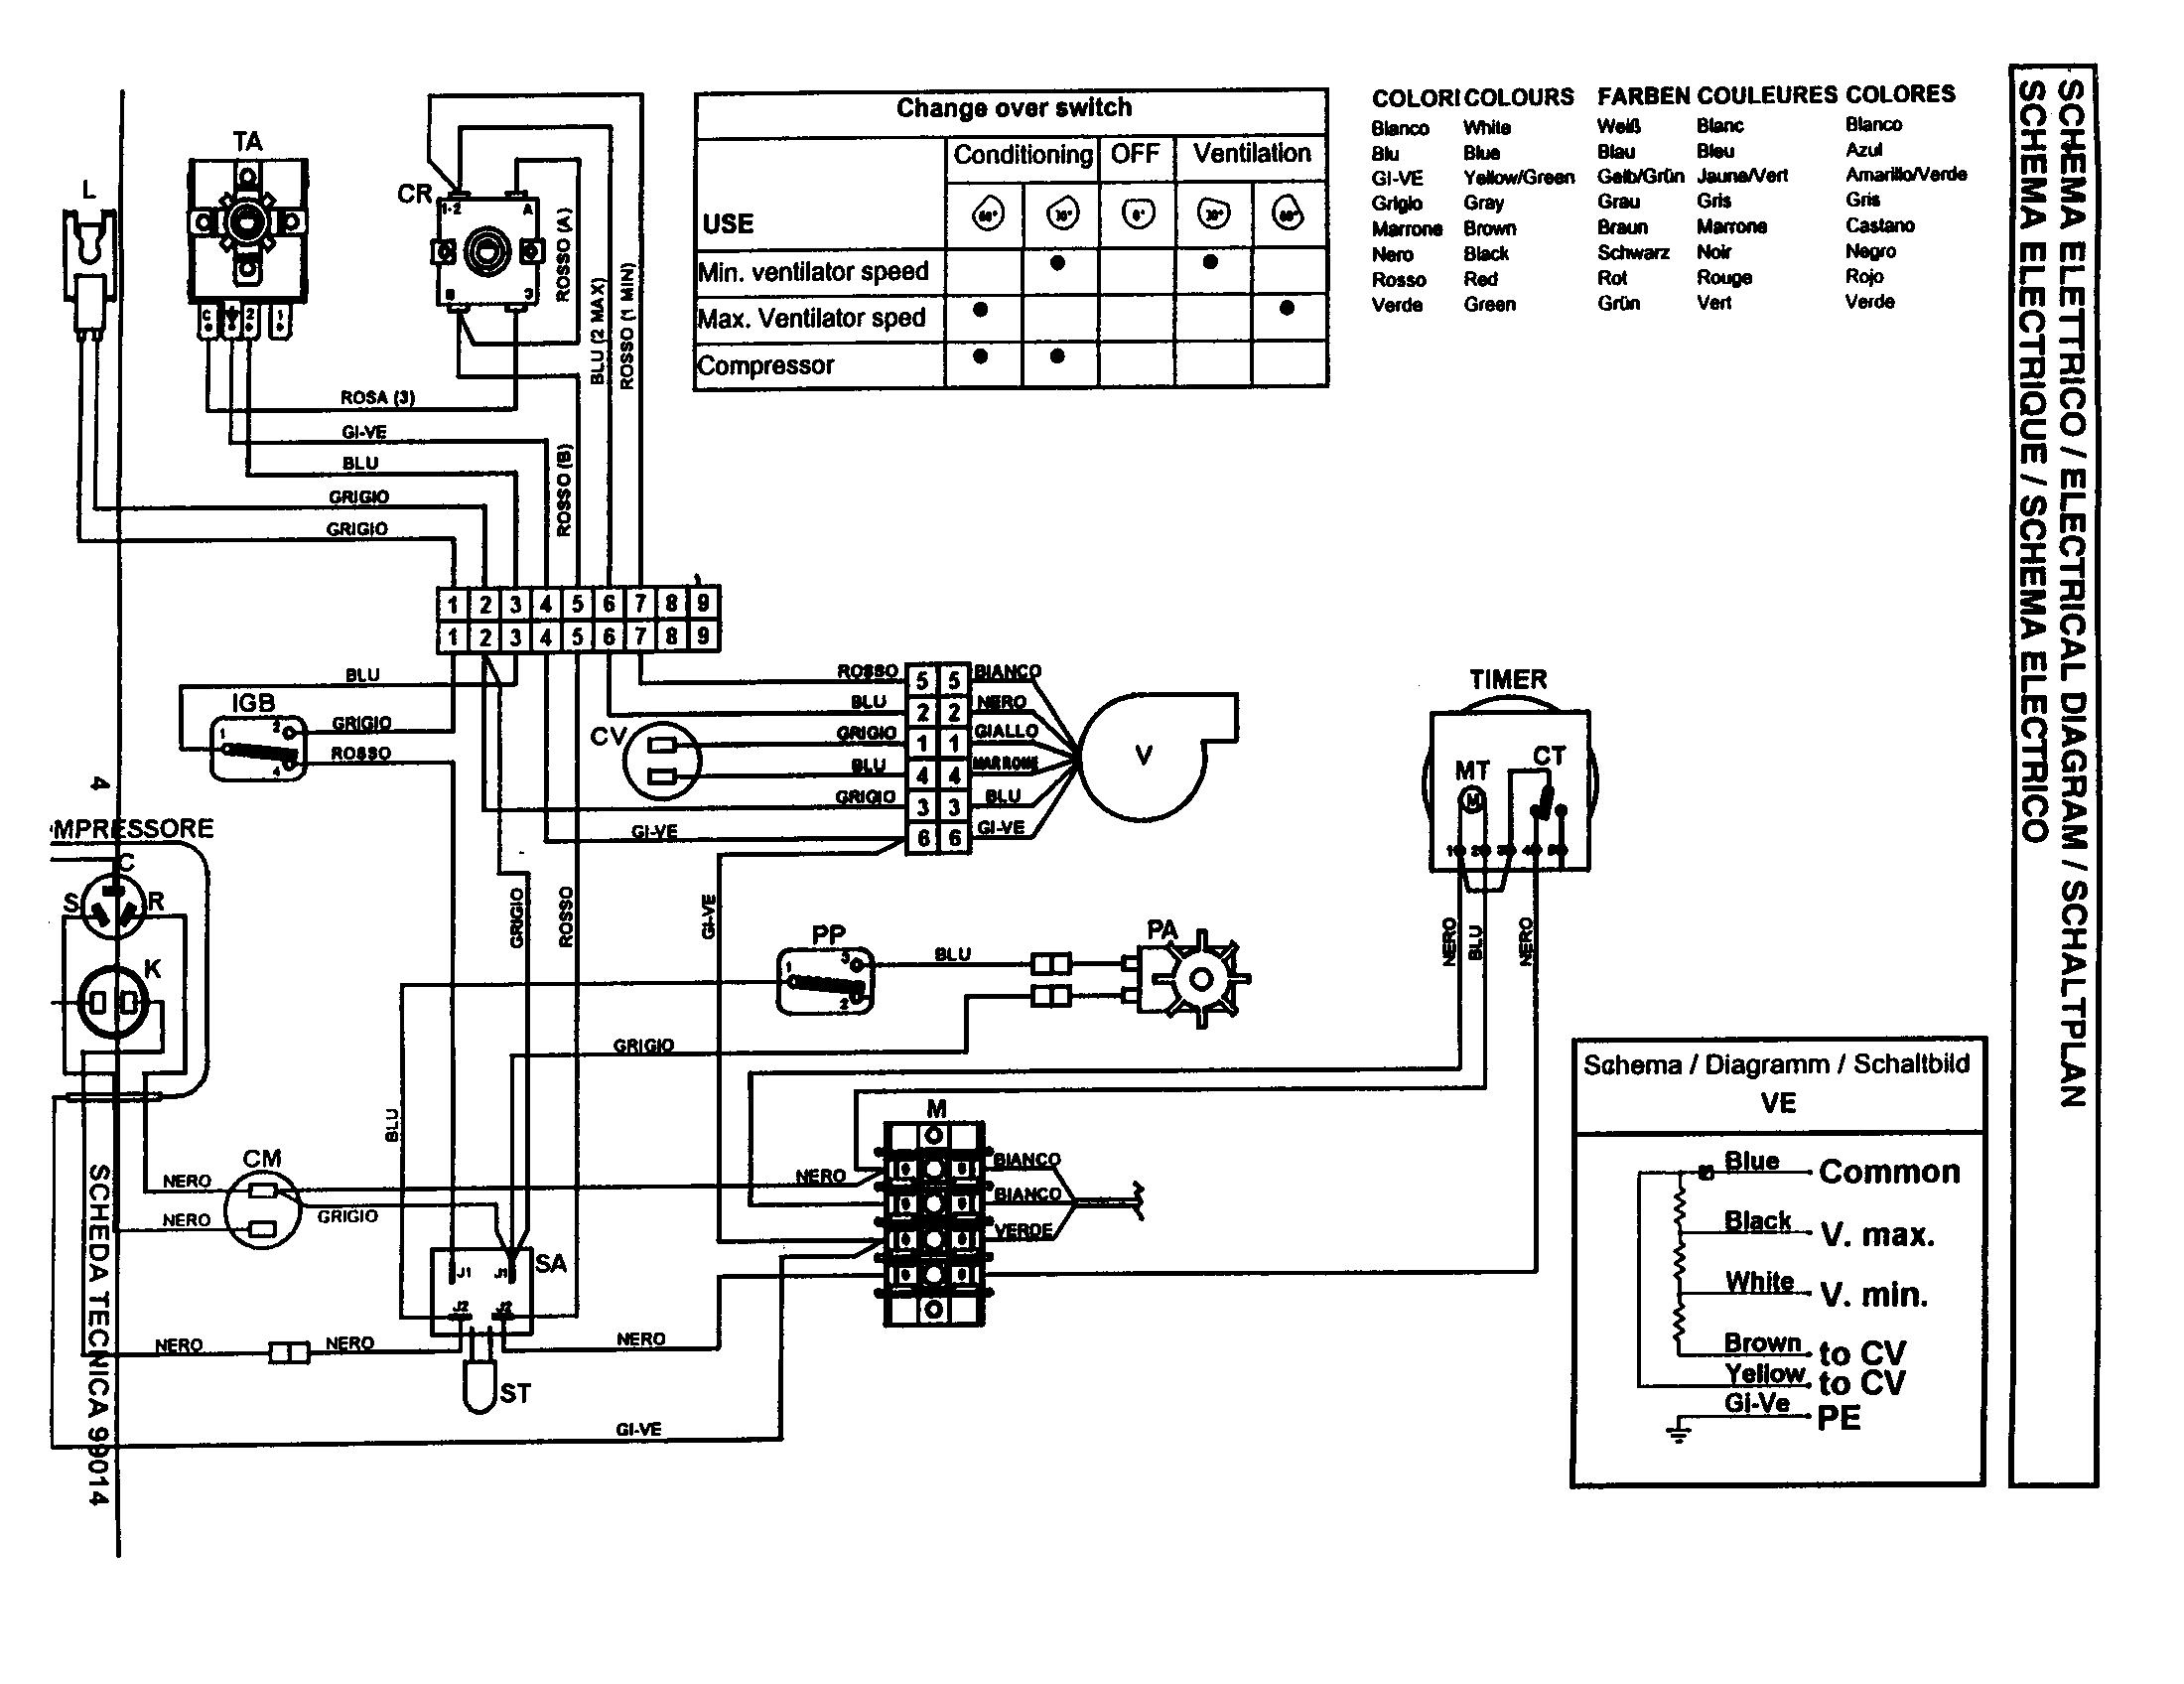 hight resolution of 2 ton ac unit diagram